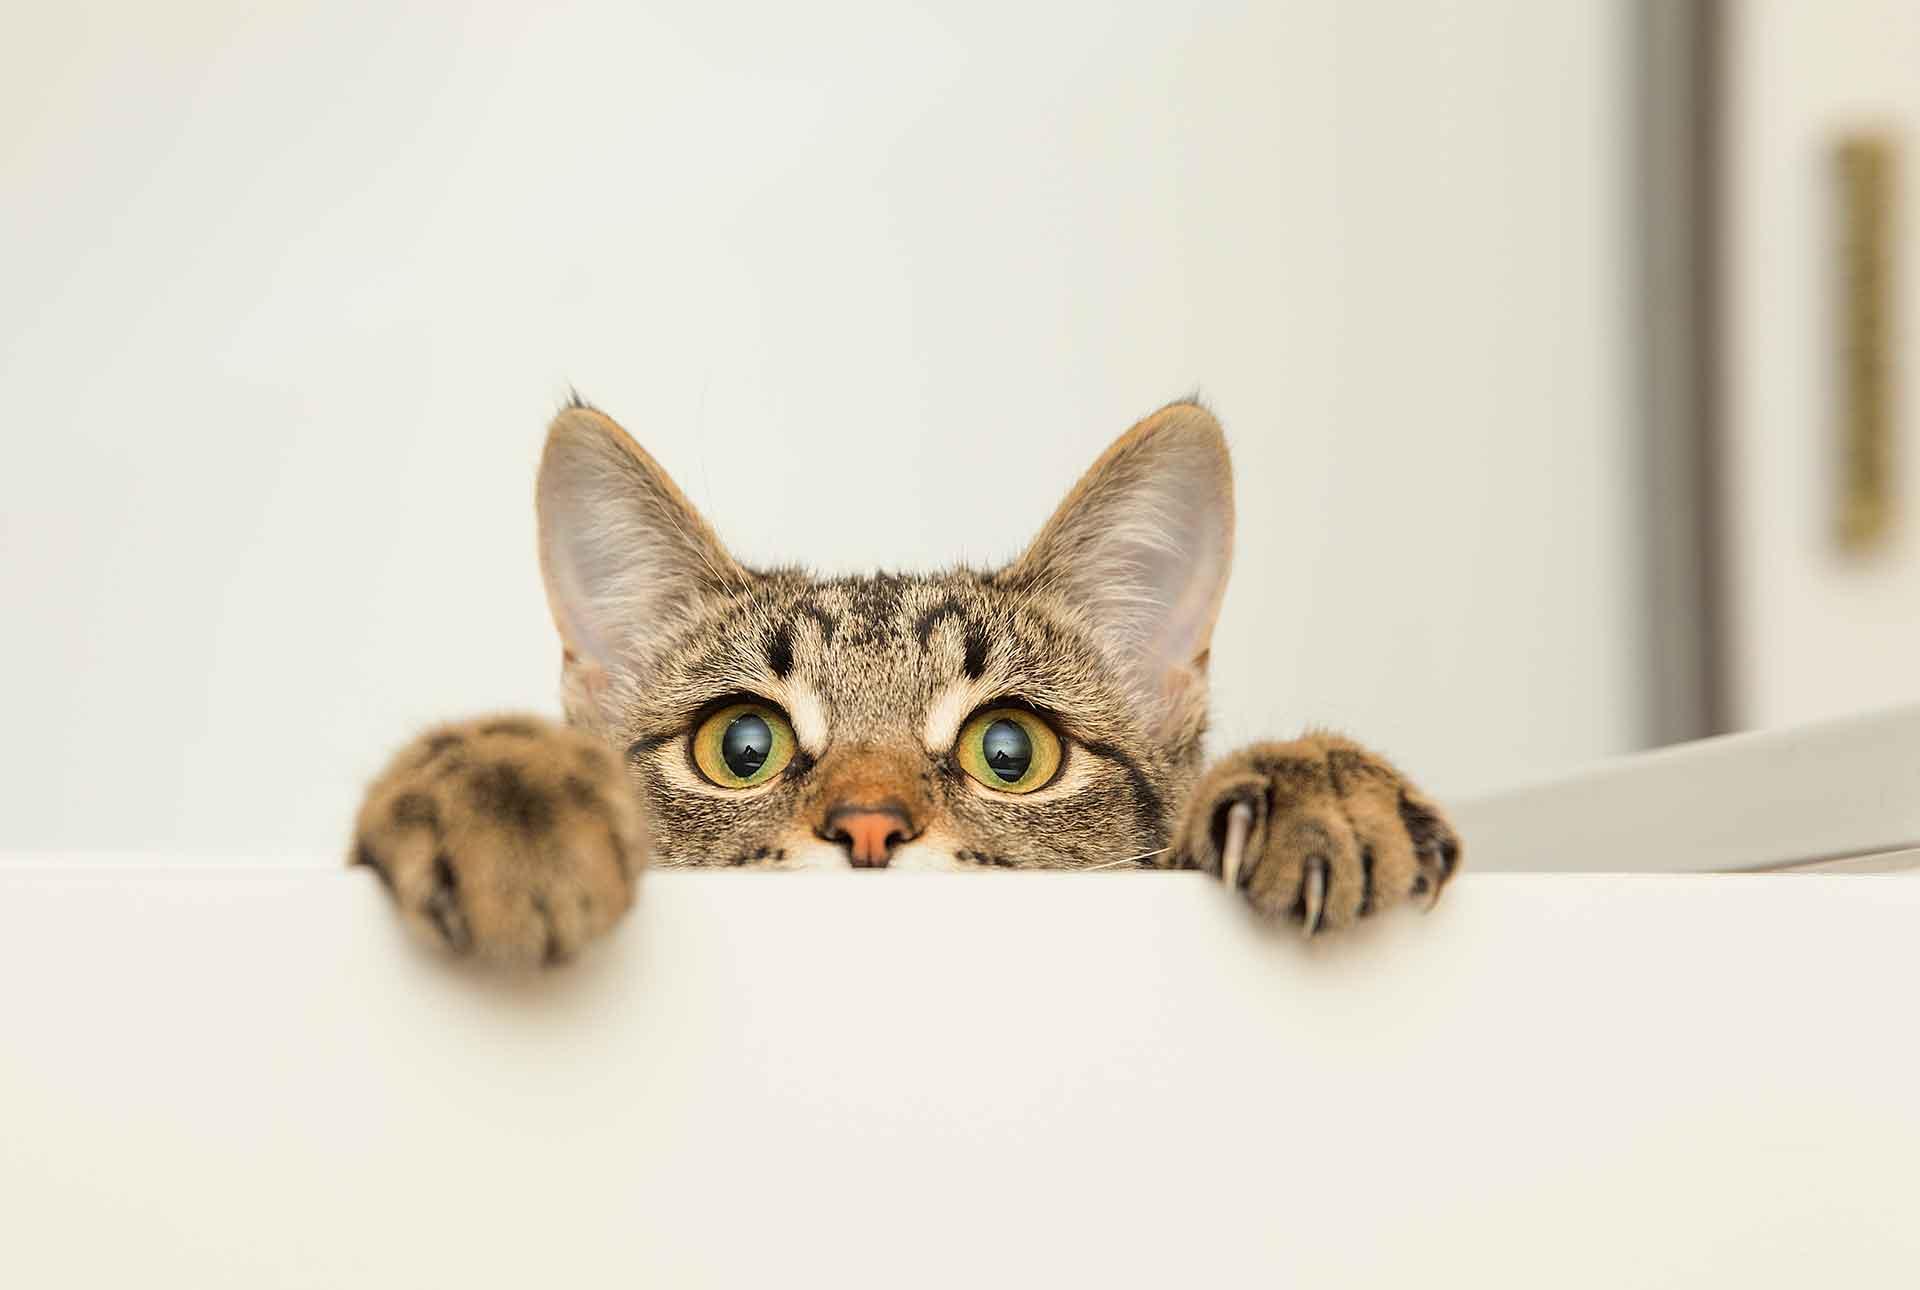 Gato asomando